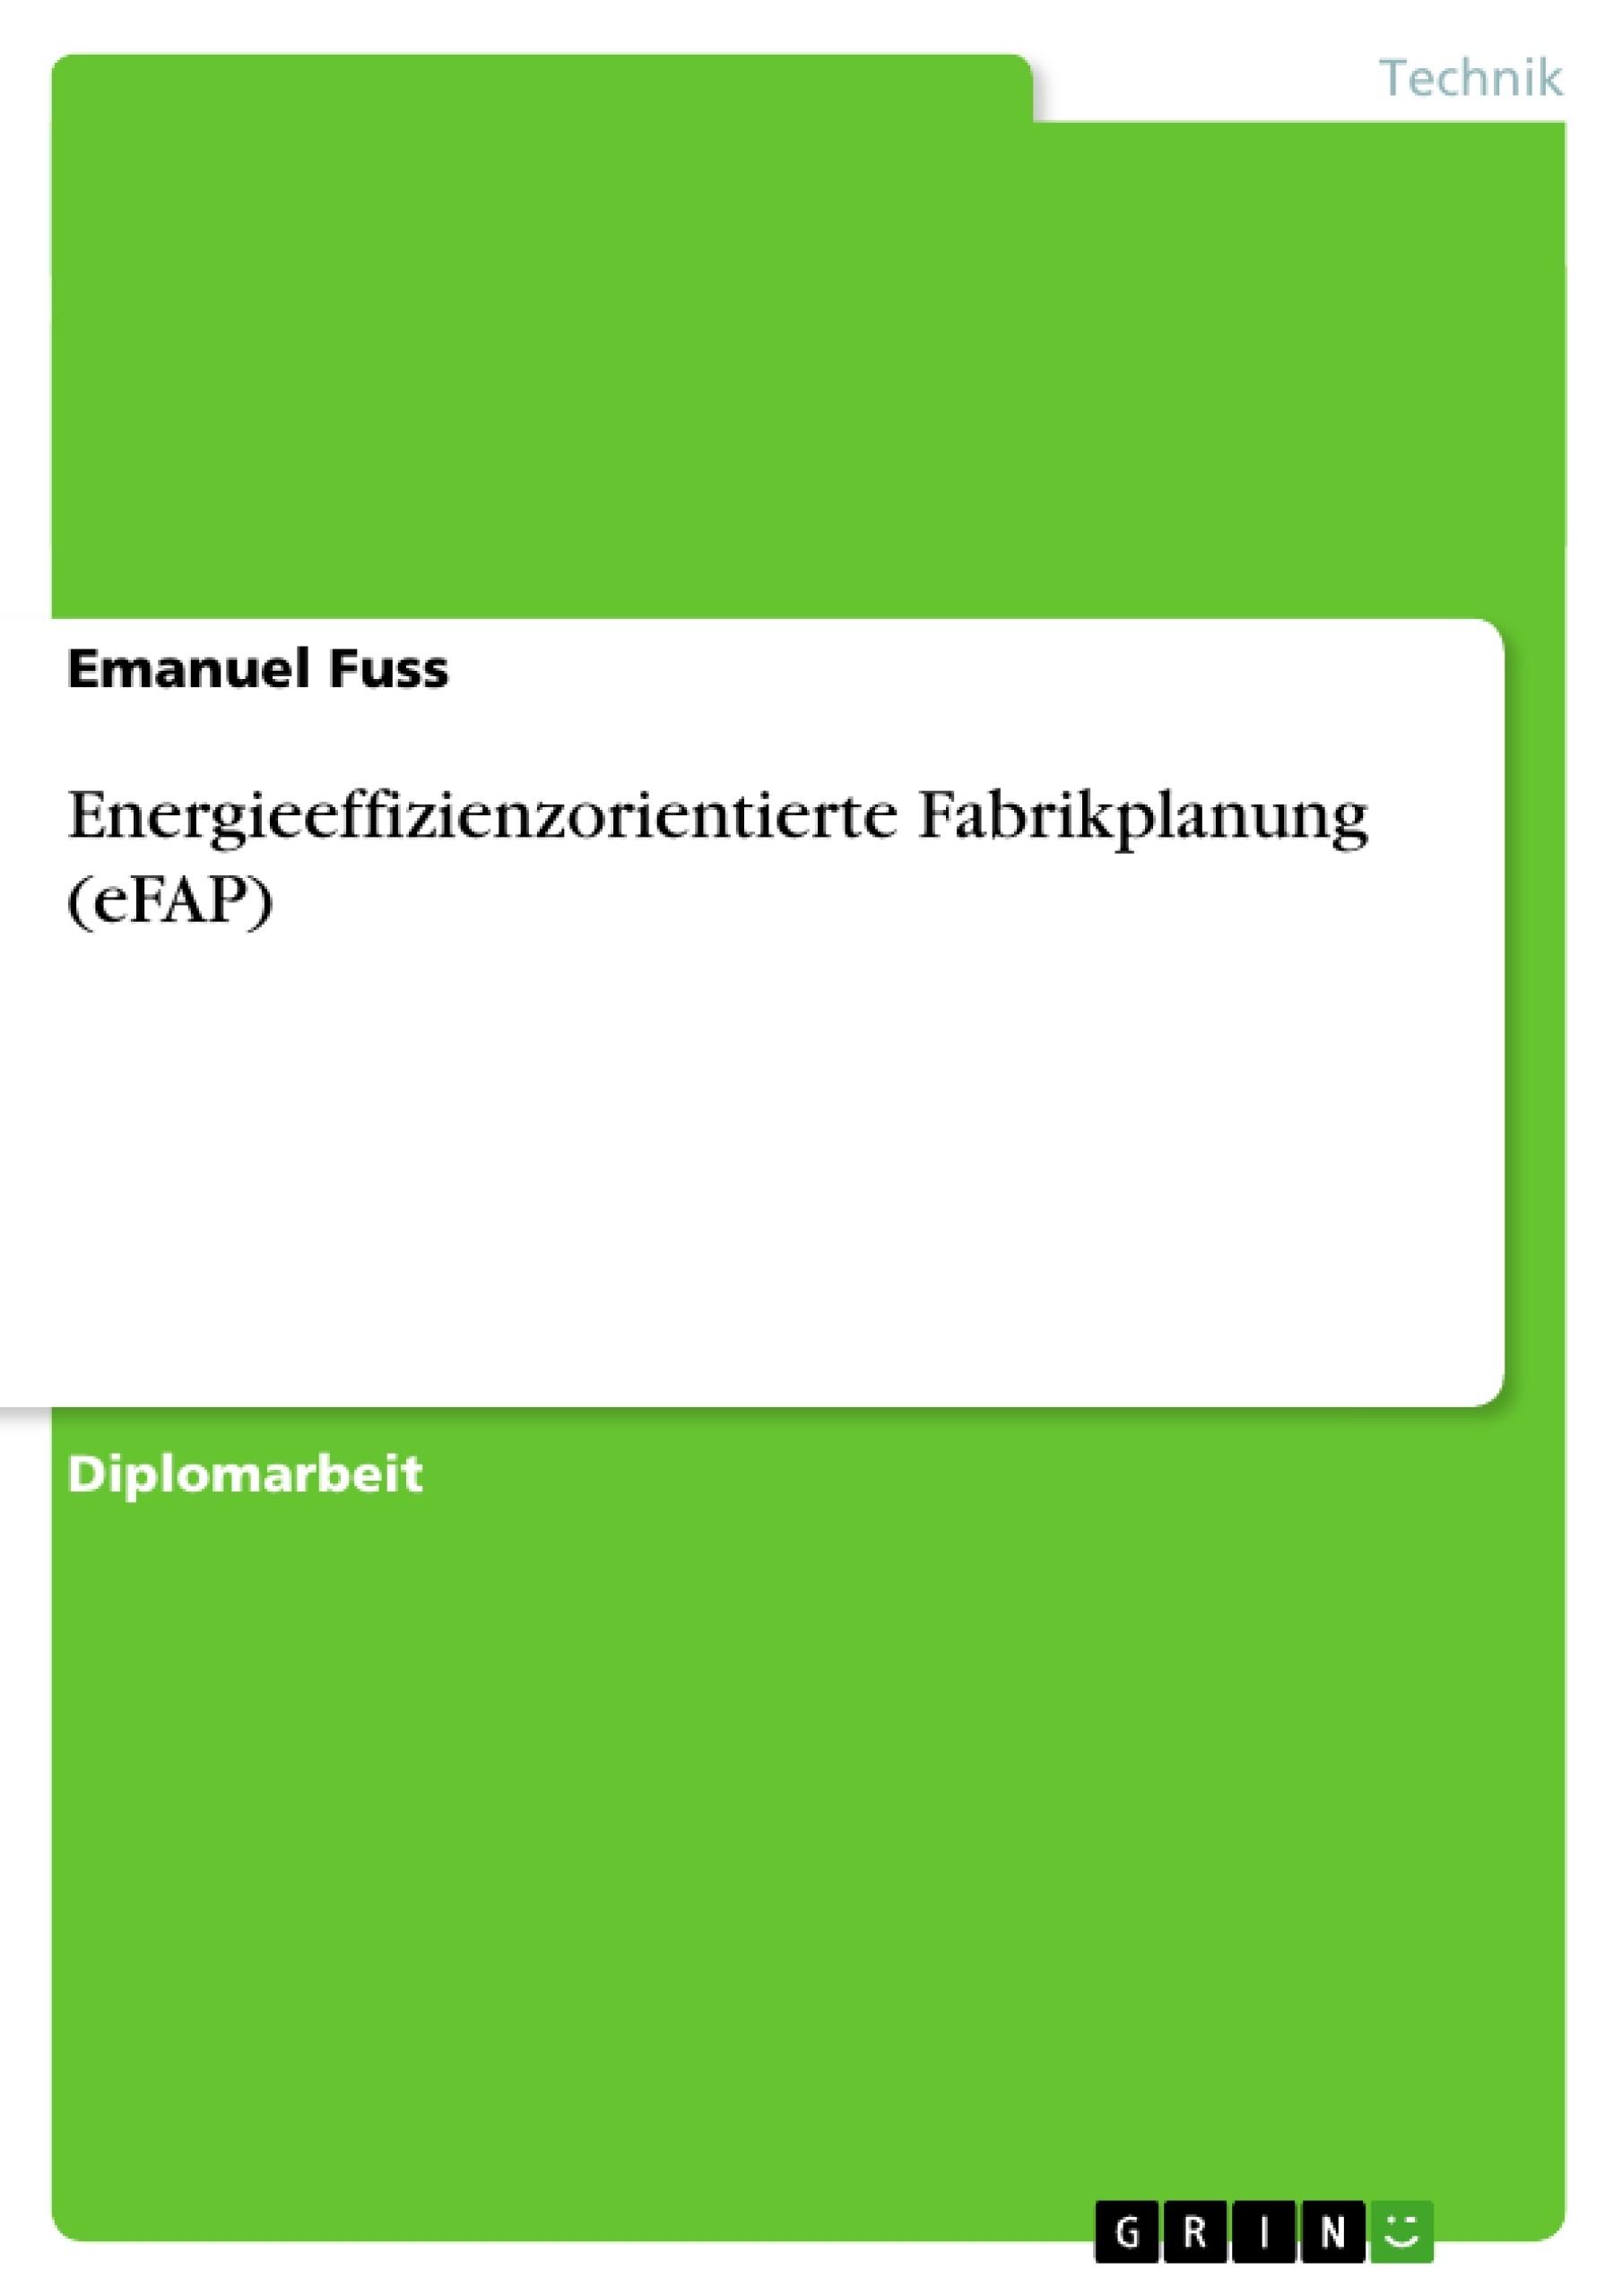 Titel: Energieeffizienzorientierte Fabrikplanung (eFAP)